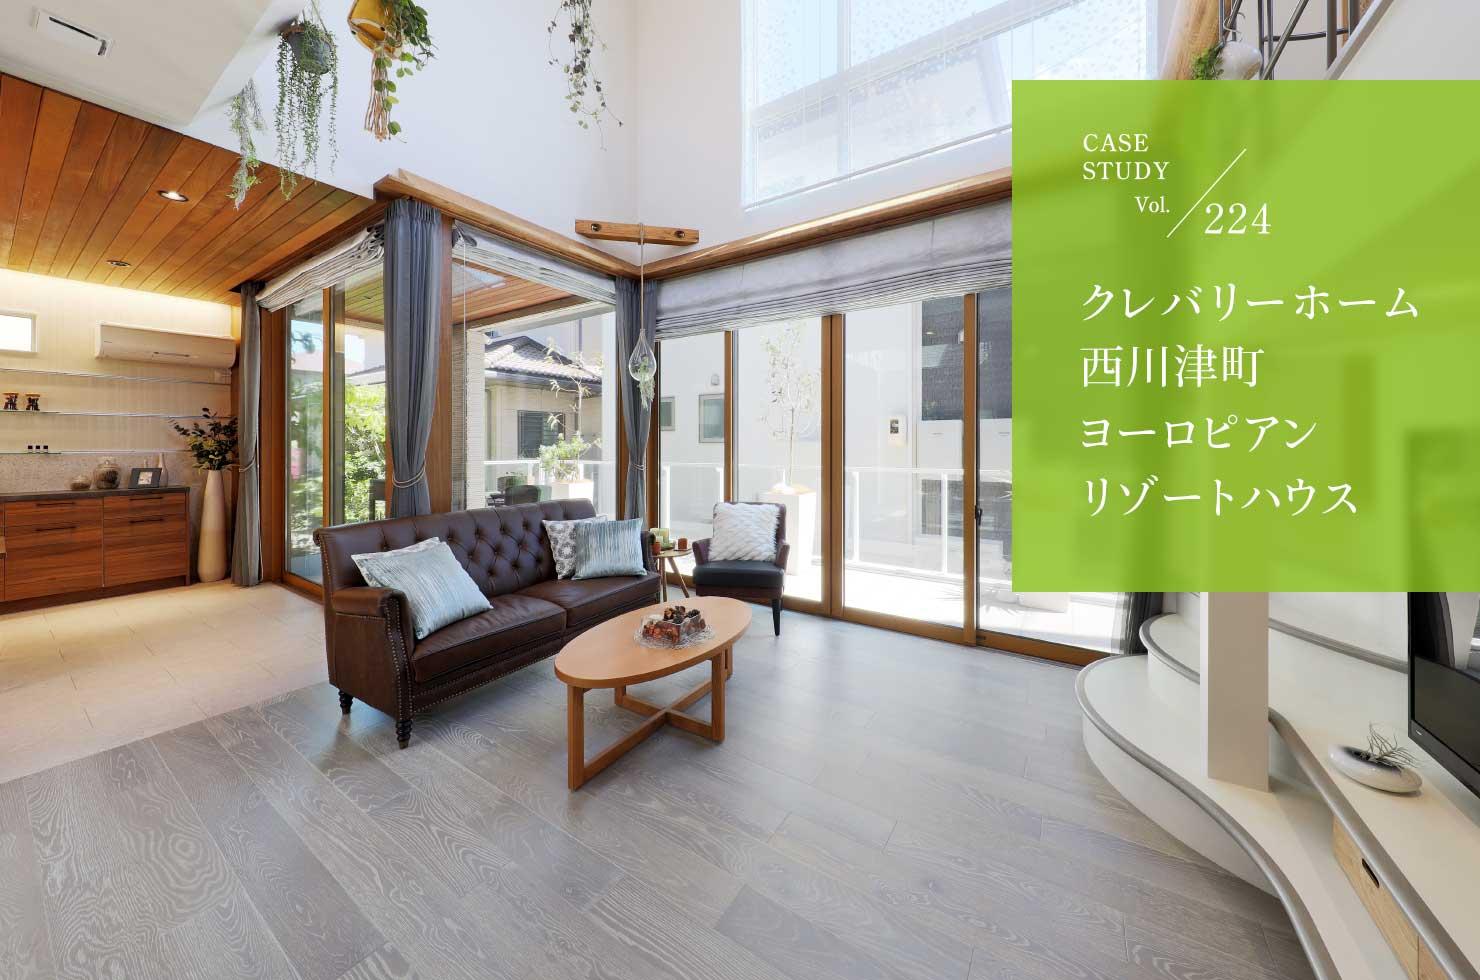 CASE STUDY vol.224 クレバリーホーム 西川津町 ヨーロピアン リゾートハウス